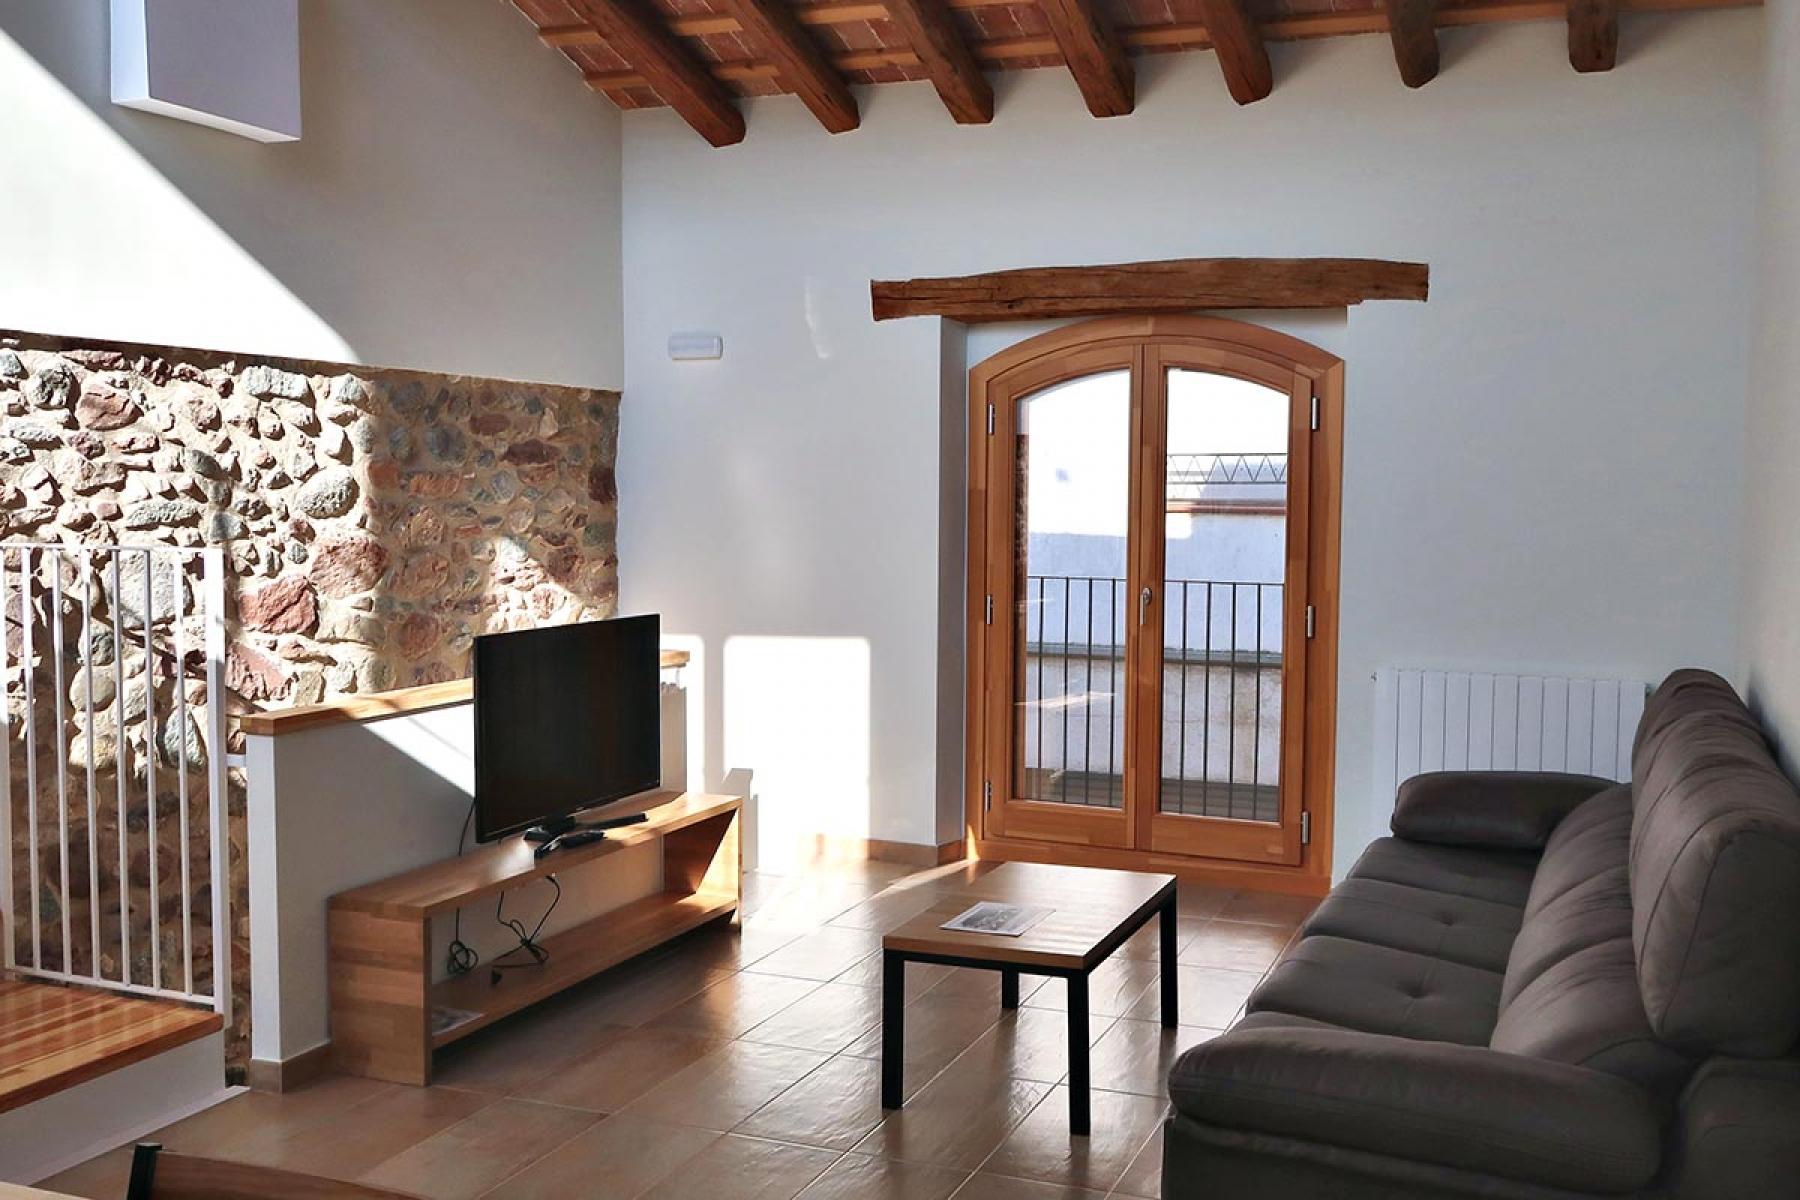 ventana de madera volta catalana aislamiento termico acustico casa rural vilaplana carrete finestres